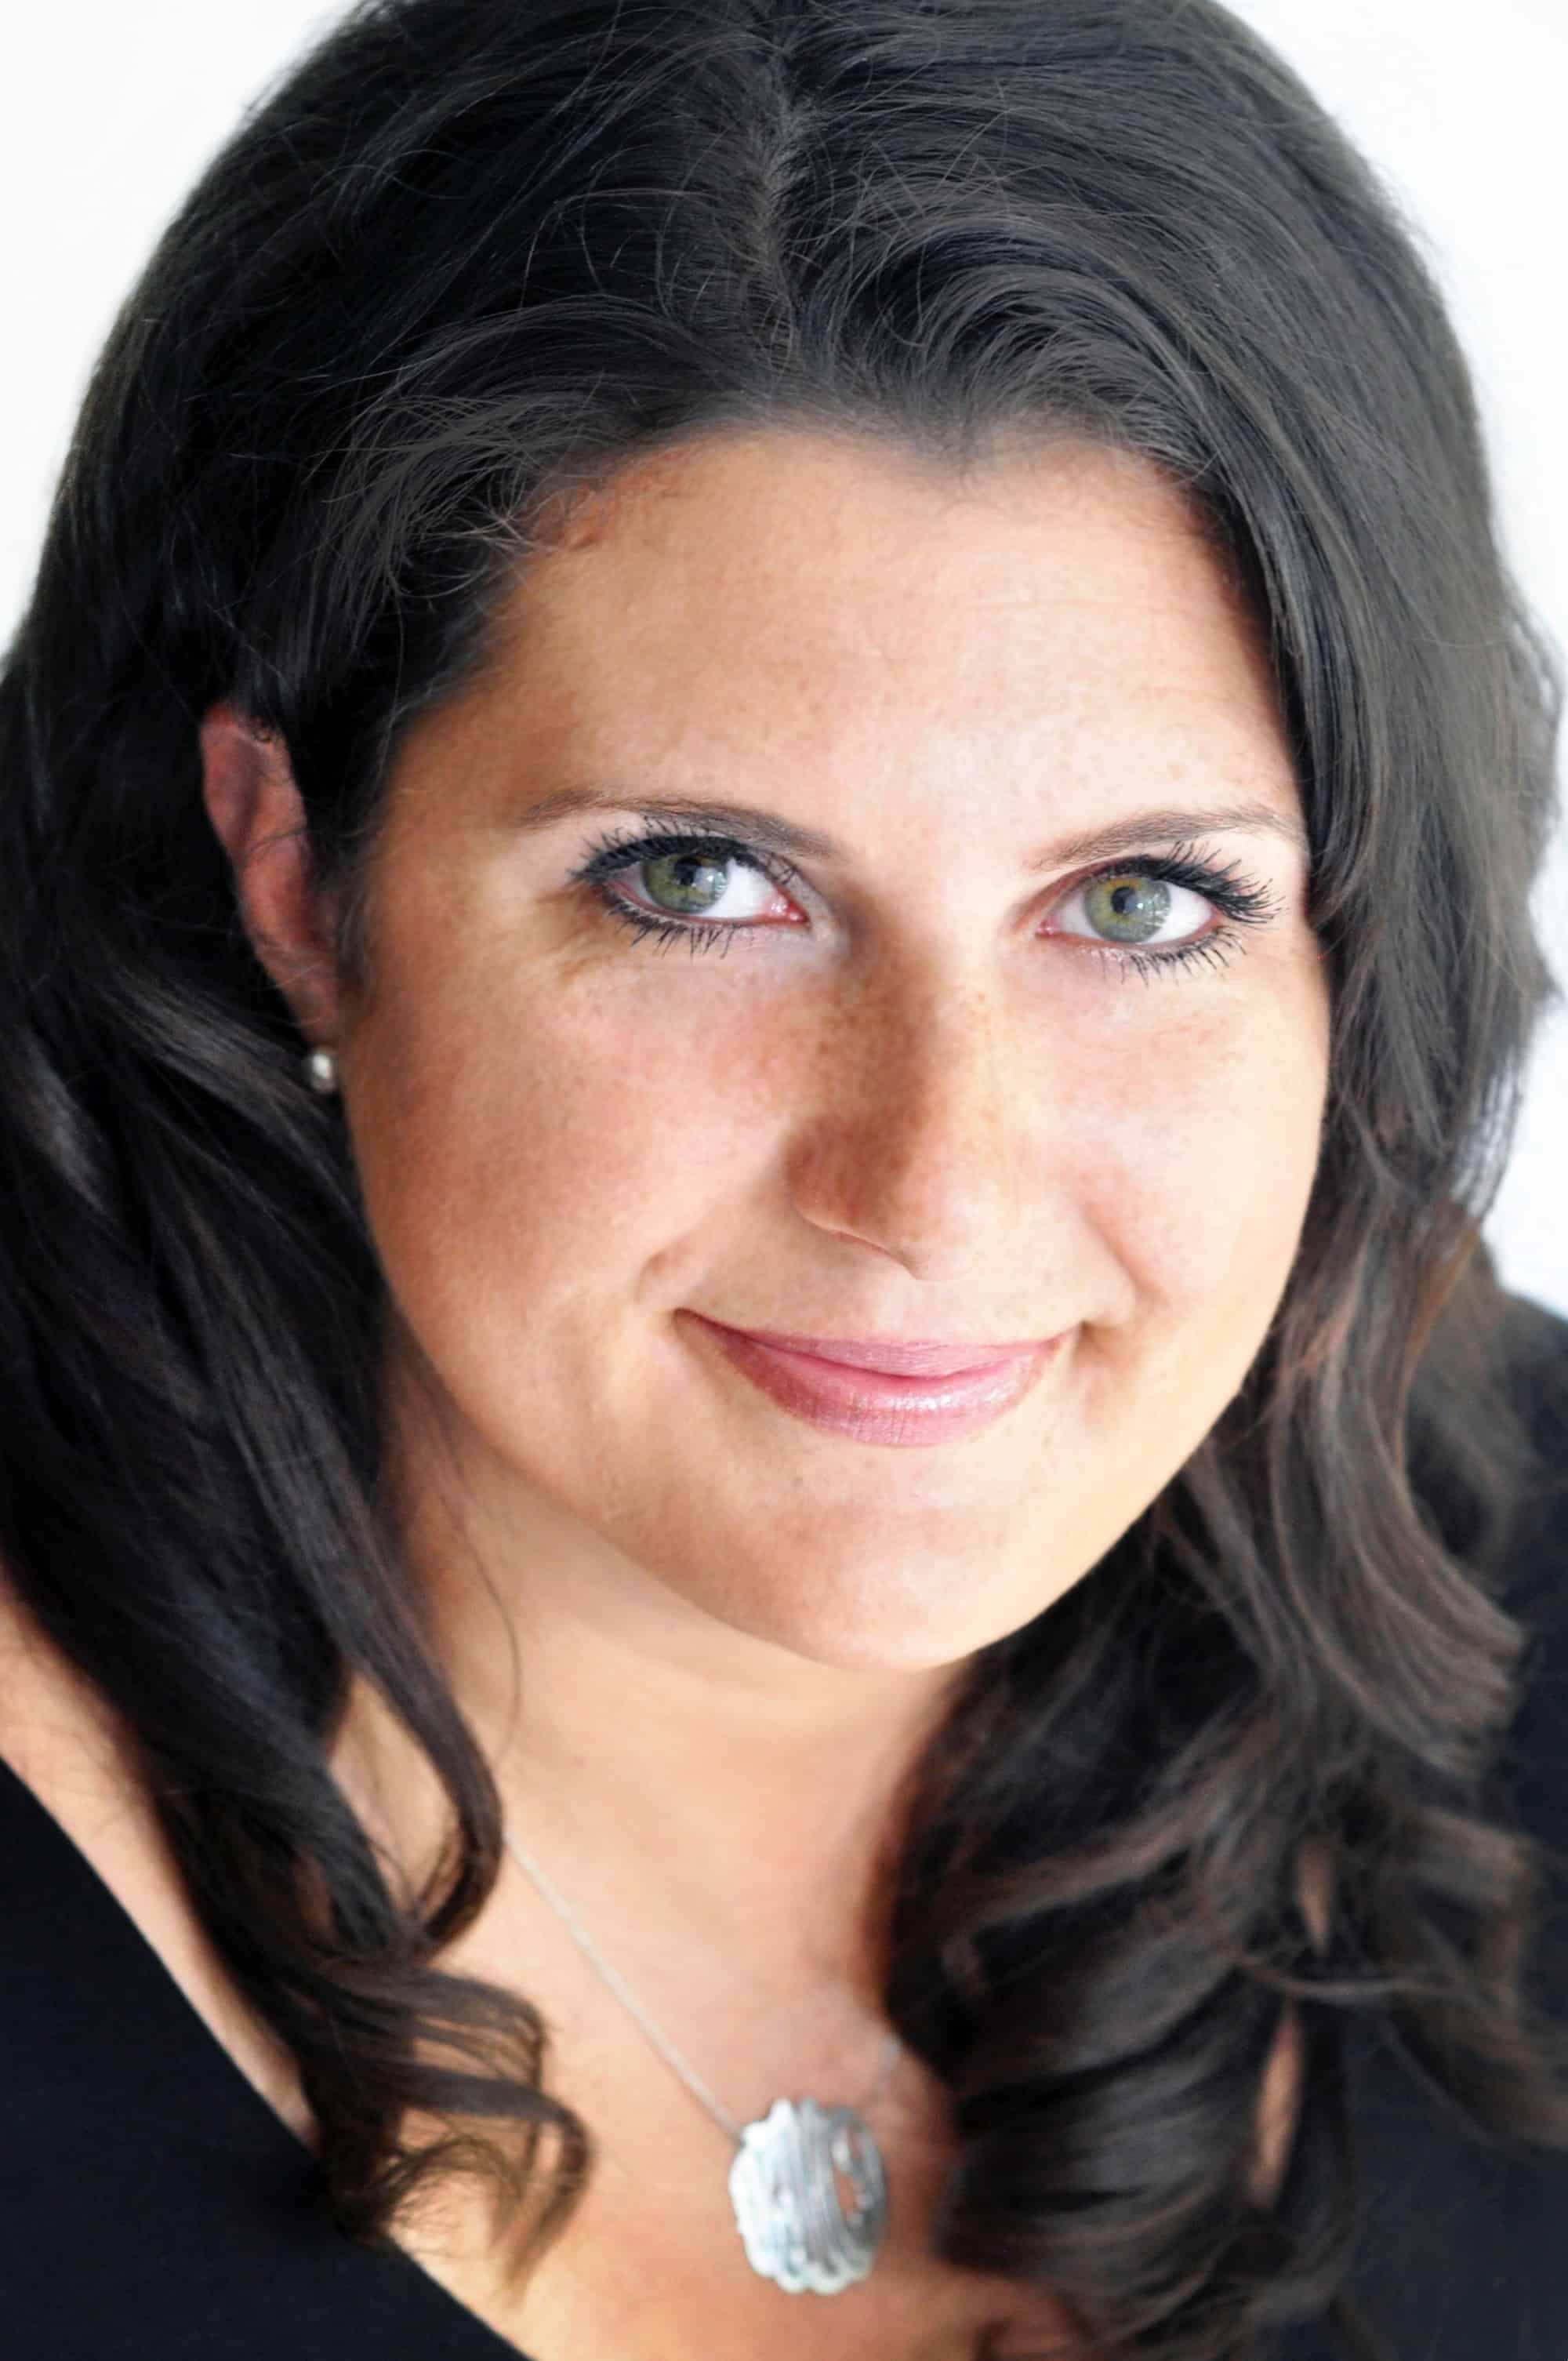 Dr. Kimberly Mehlman-Orozco